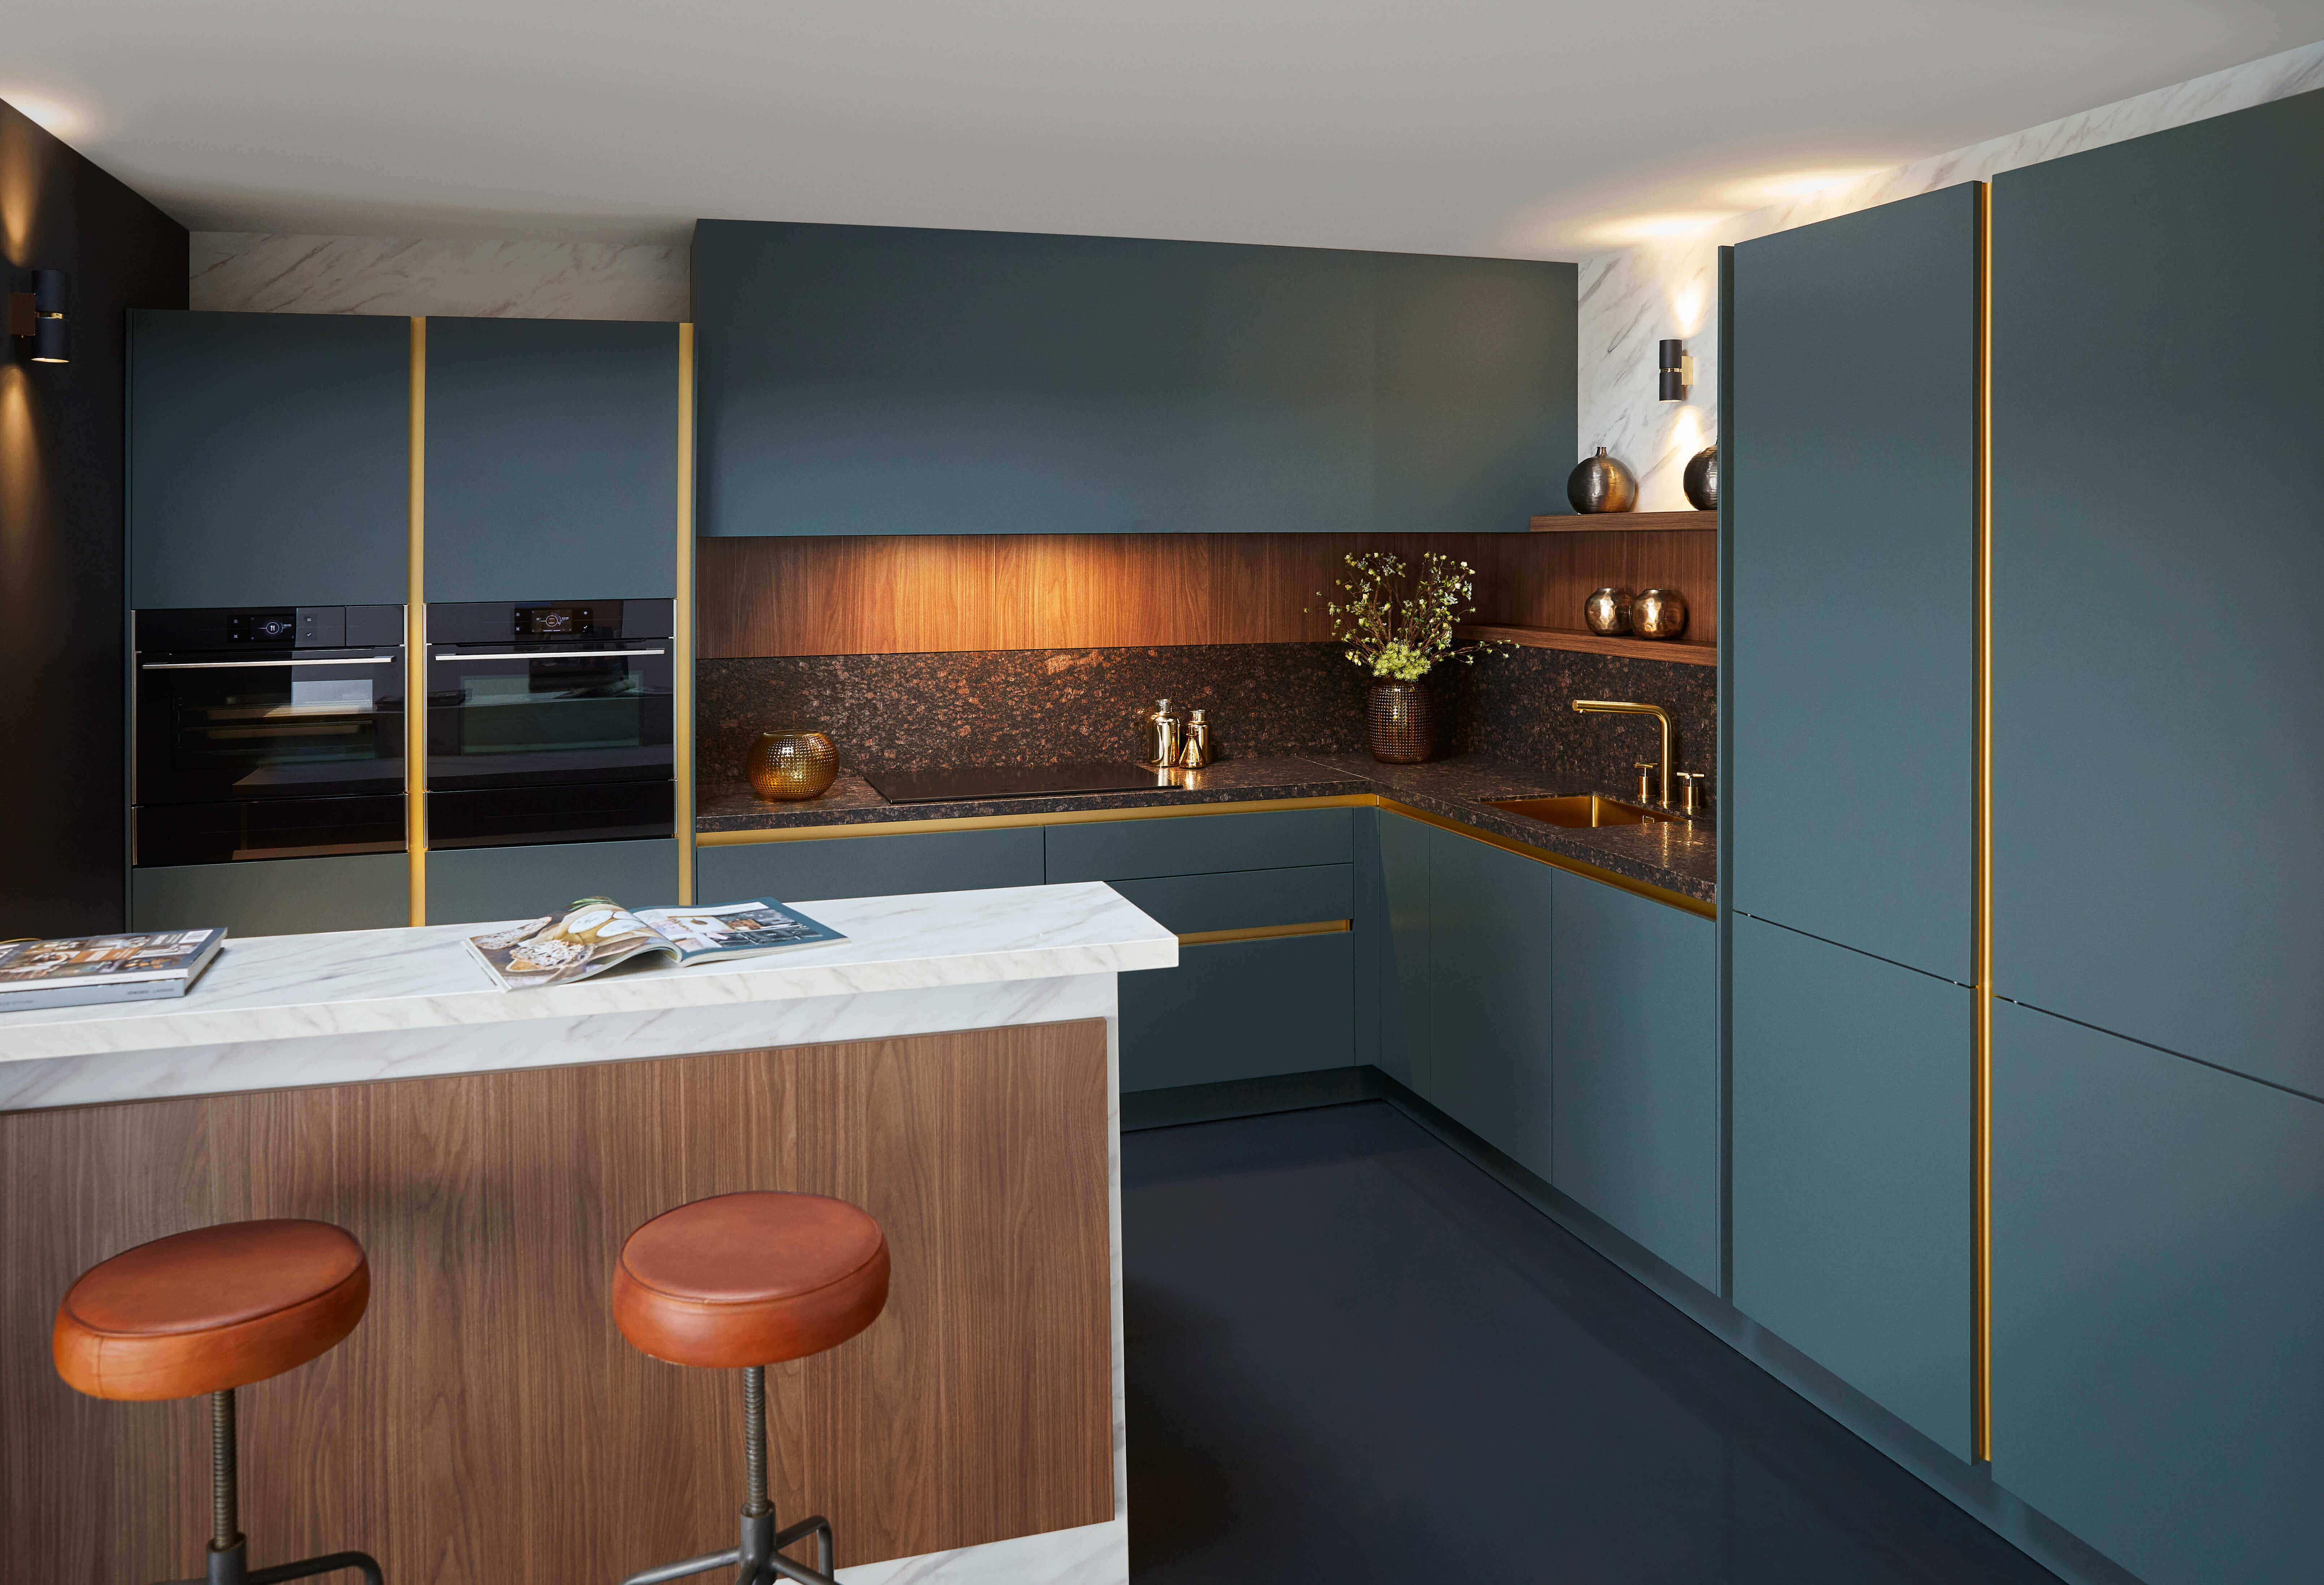 Keukenindeling